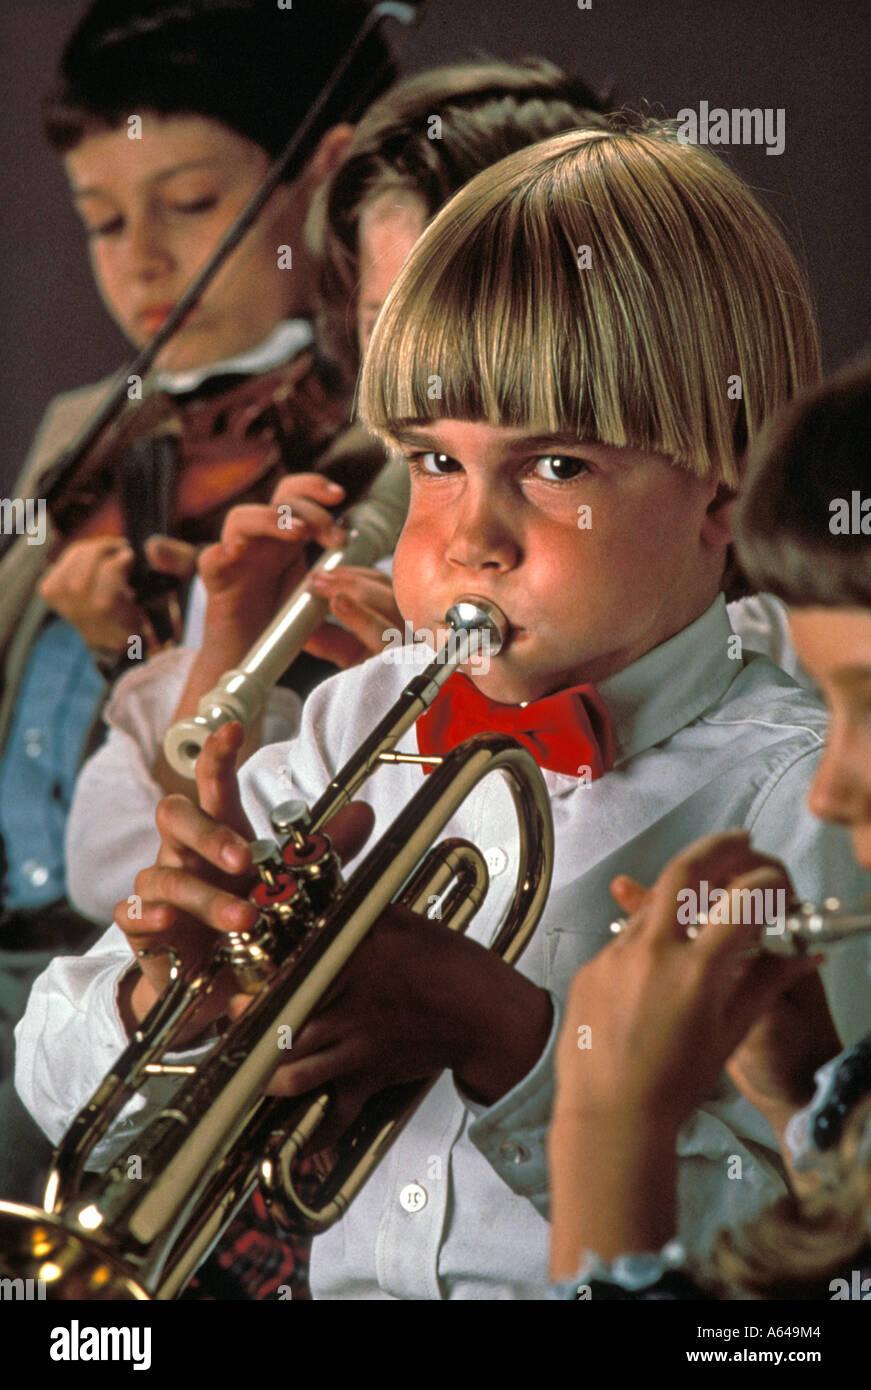 children performing at music recital - Stock Image